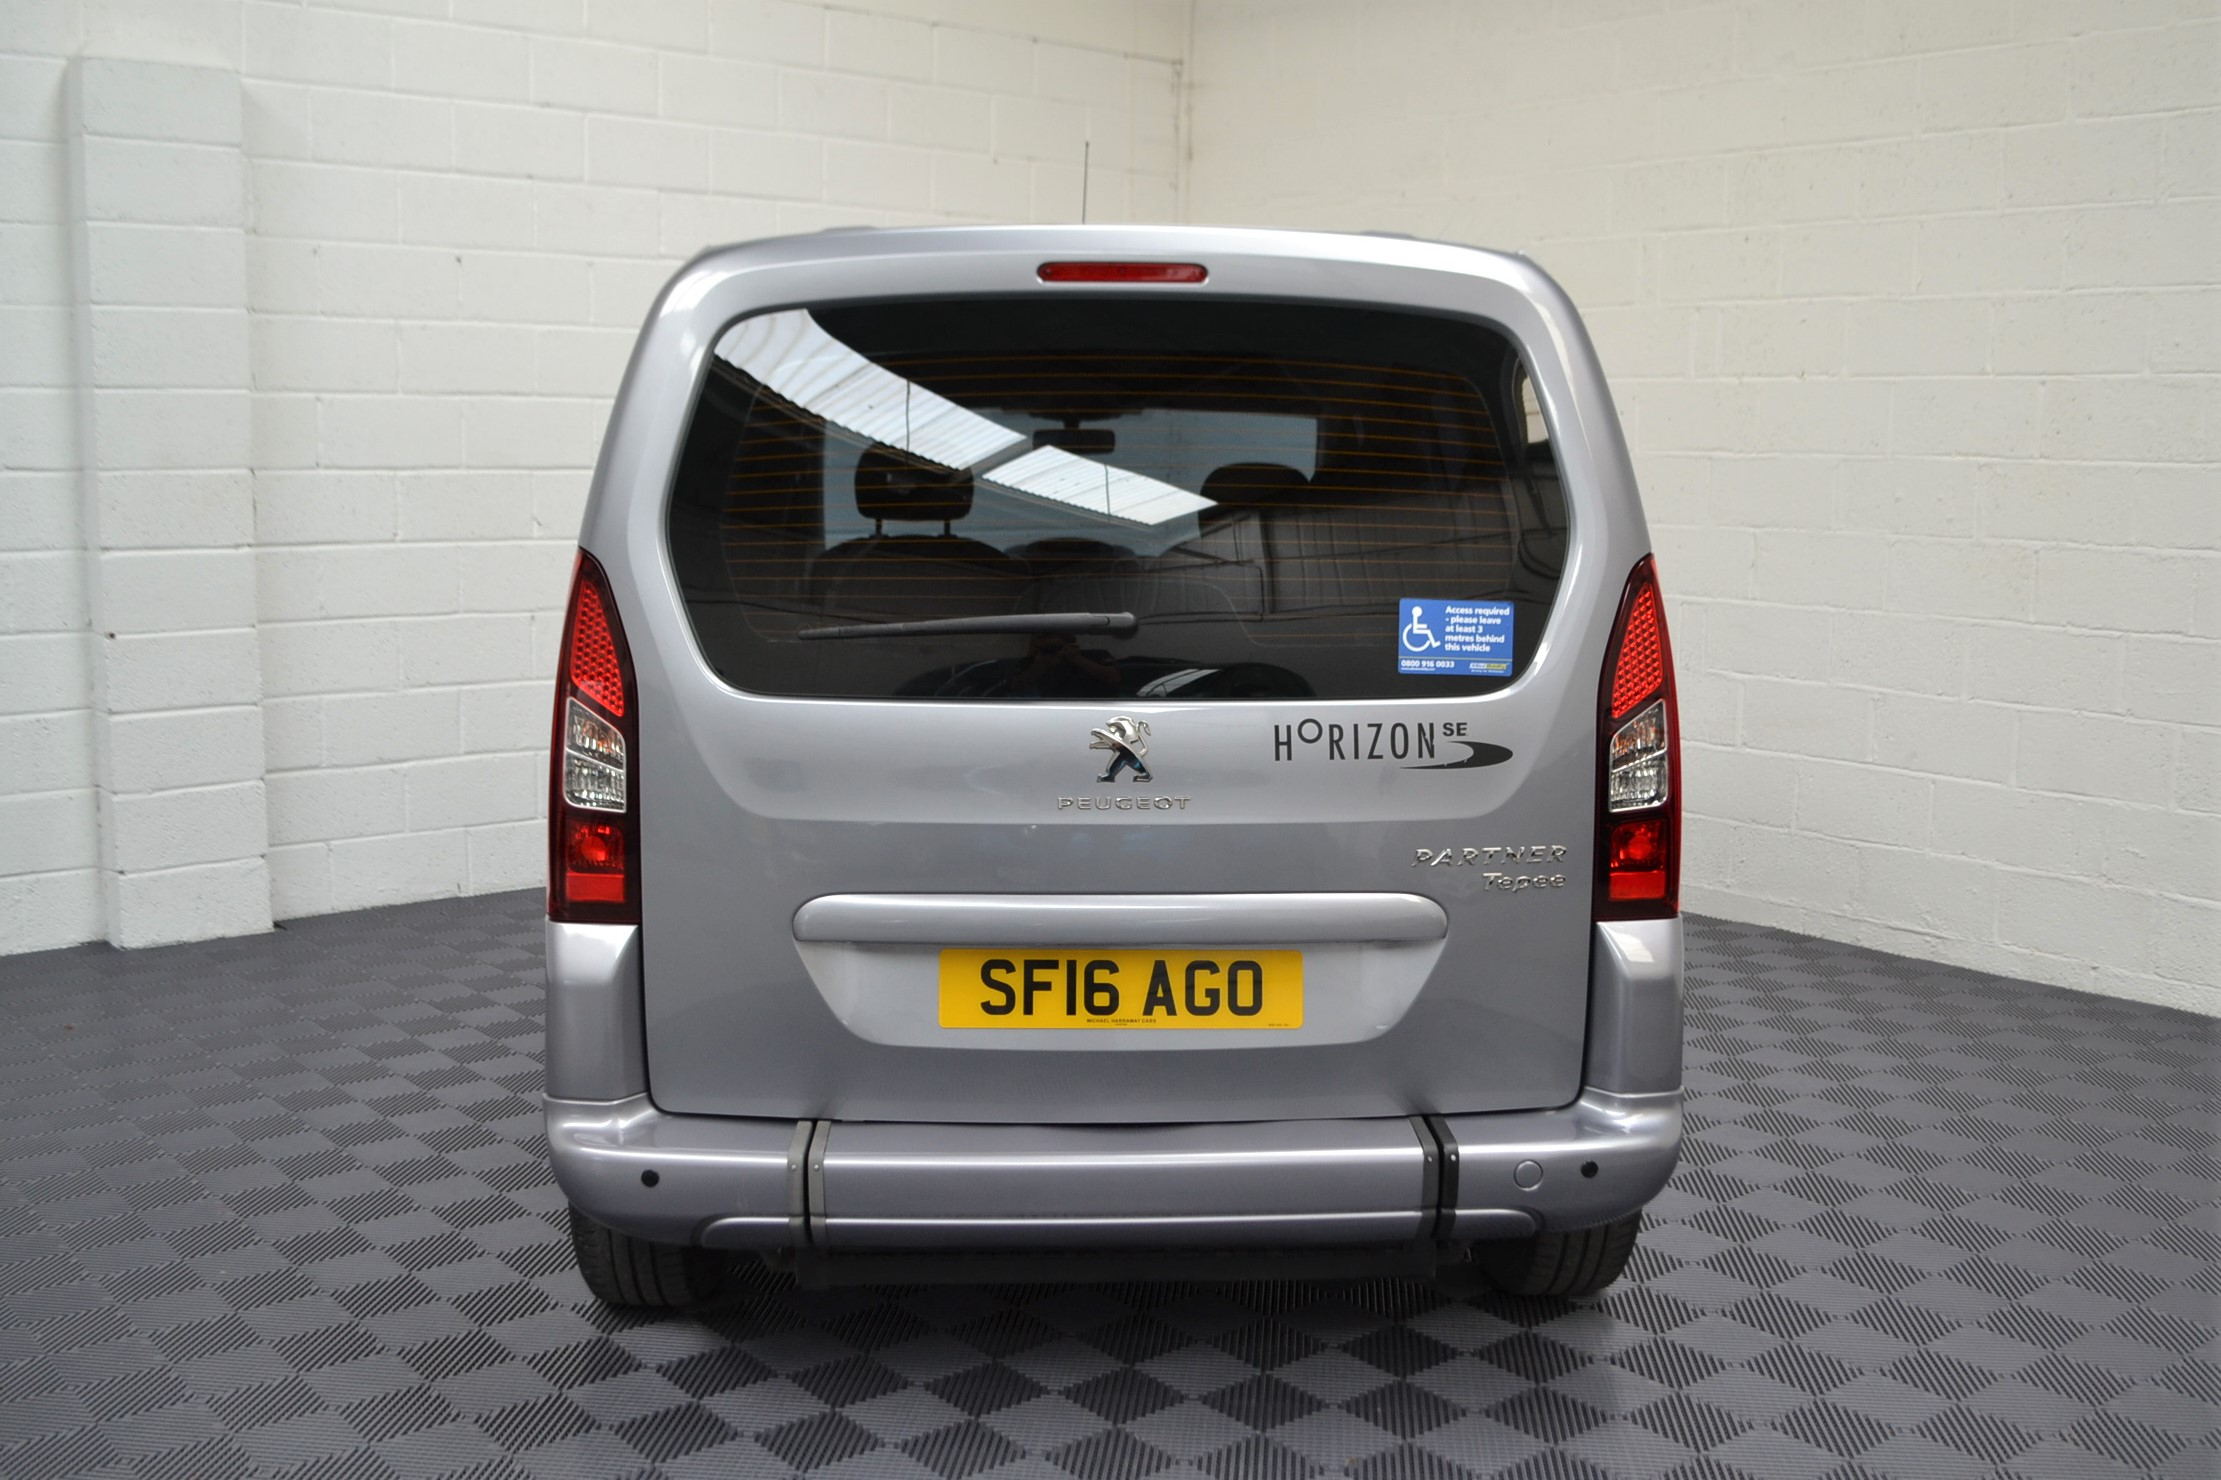 Used Wav Cars for Sale UK Citroen Berlingo WAV Car Peugeot Partner Petrol Wheelchair Accessible Vehicles Buy Sell Bristol Somerset Devon Dorset 4